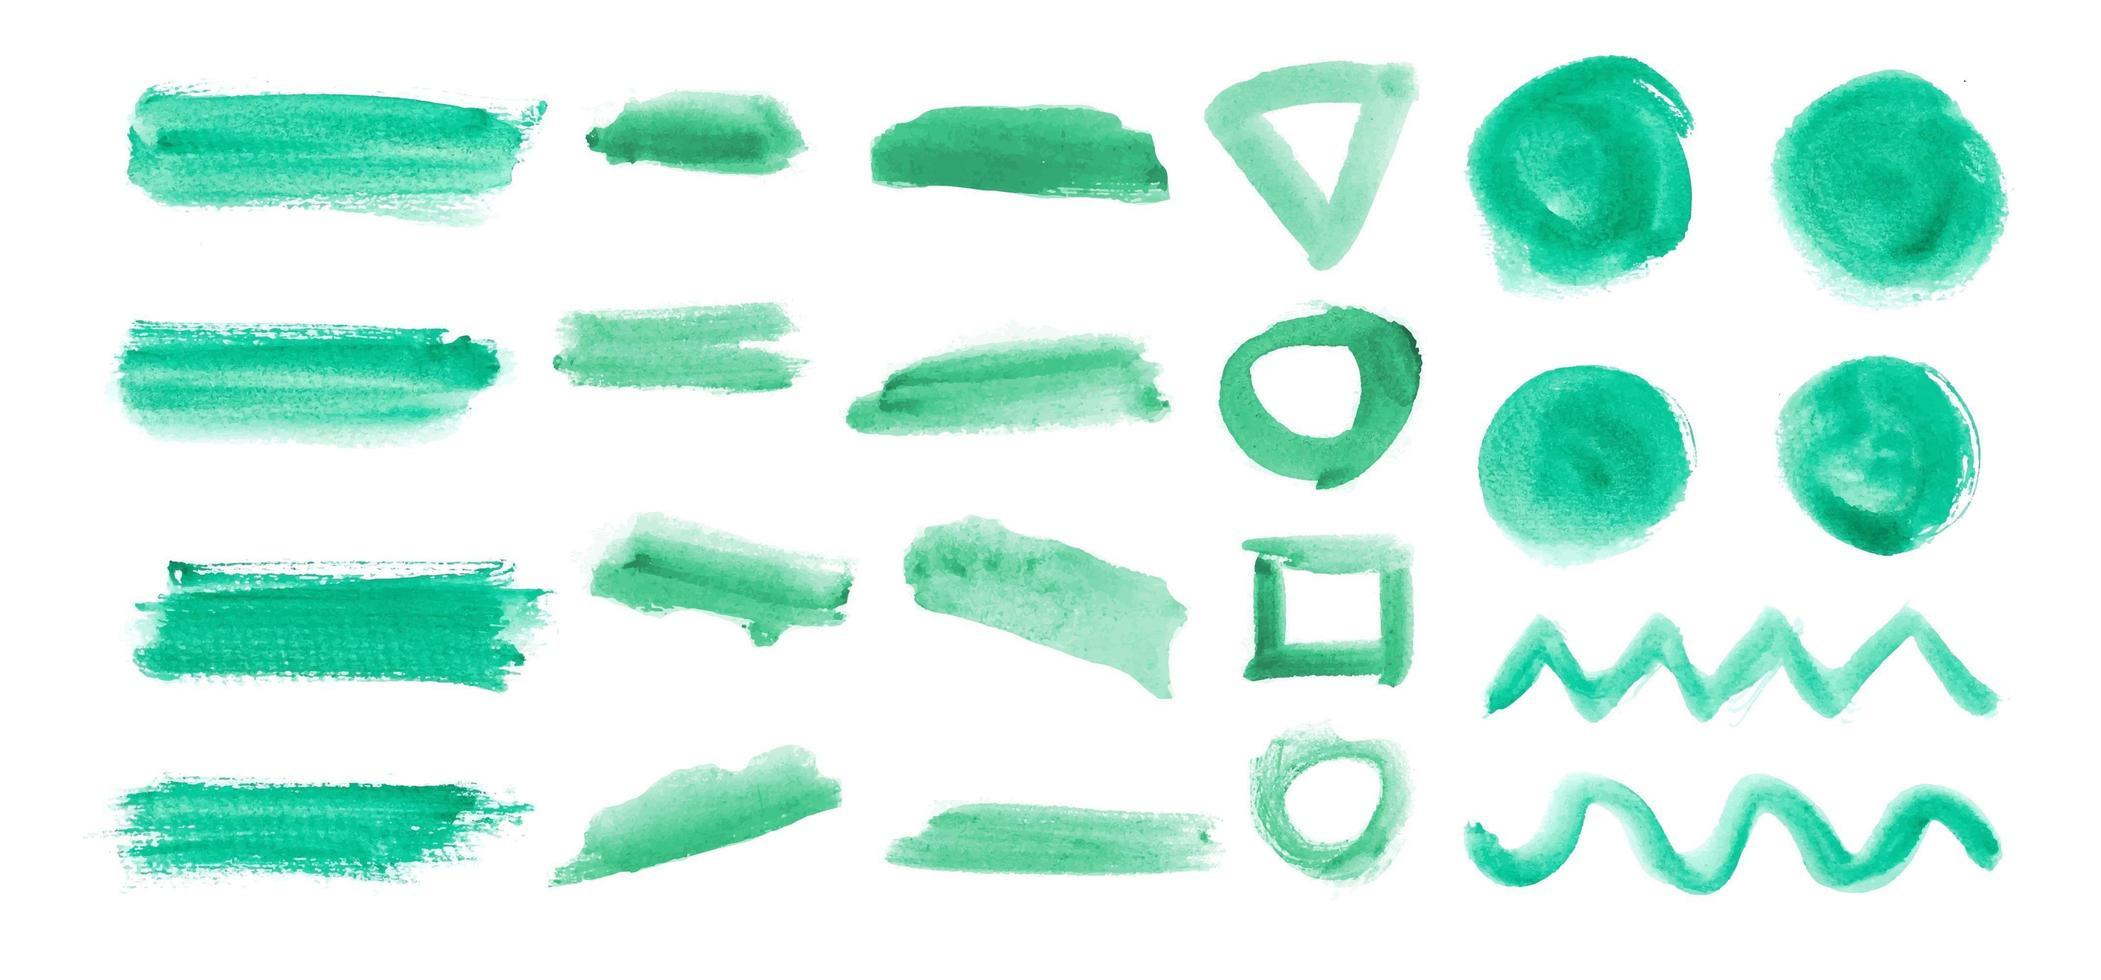 insieme di elementi di pennellata verde vettore